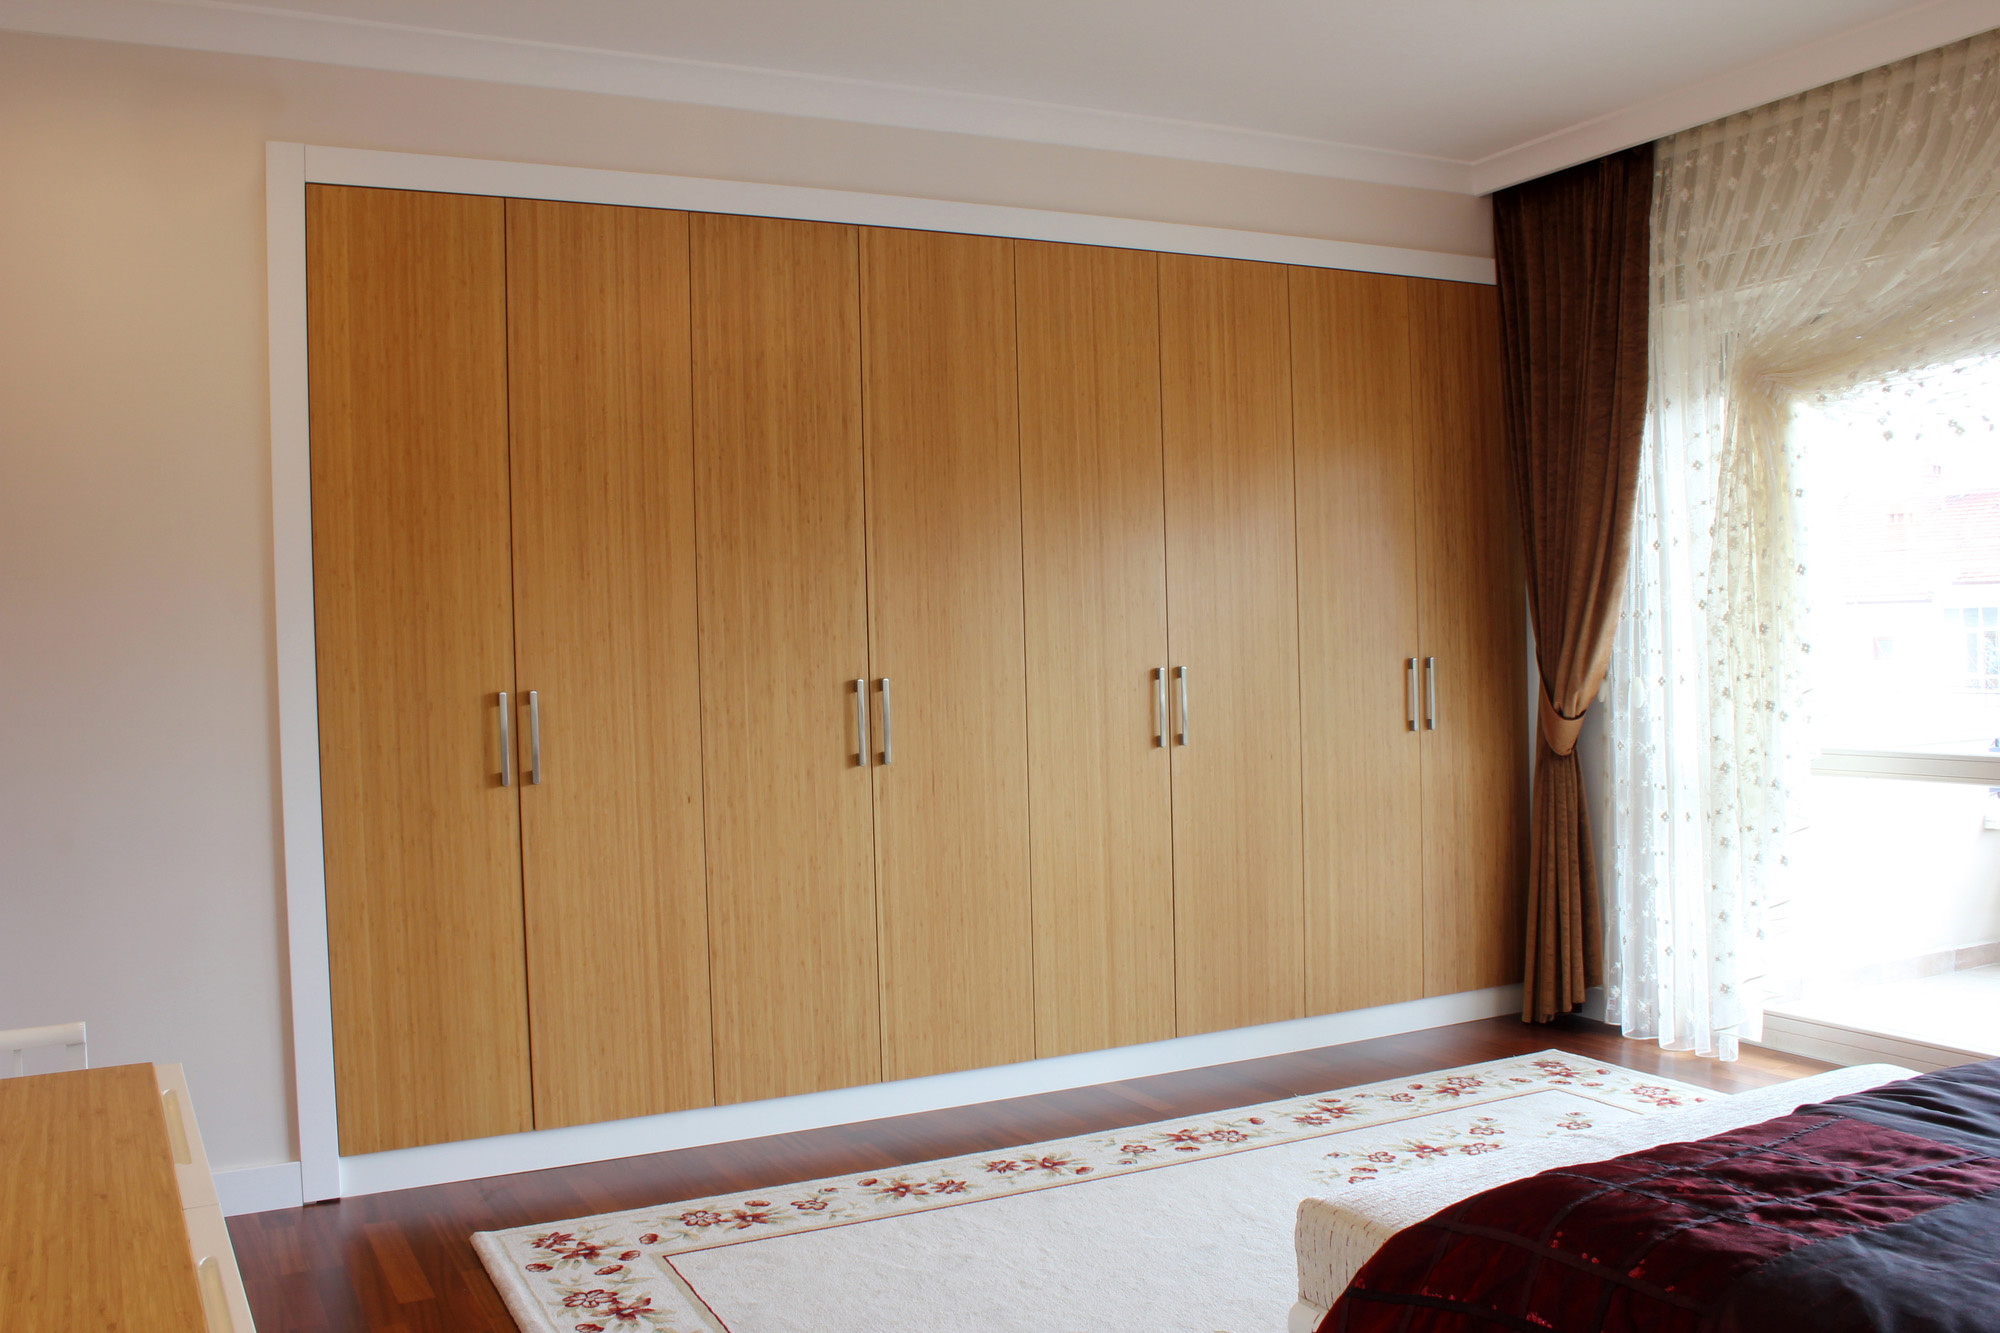 fitted wardrobe, hinged wardrobe door, modern wardrobe